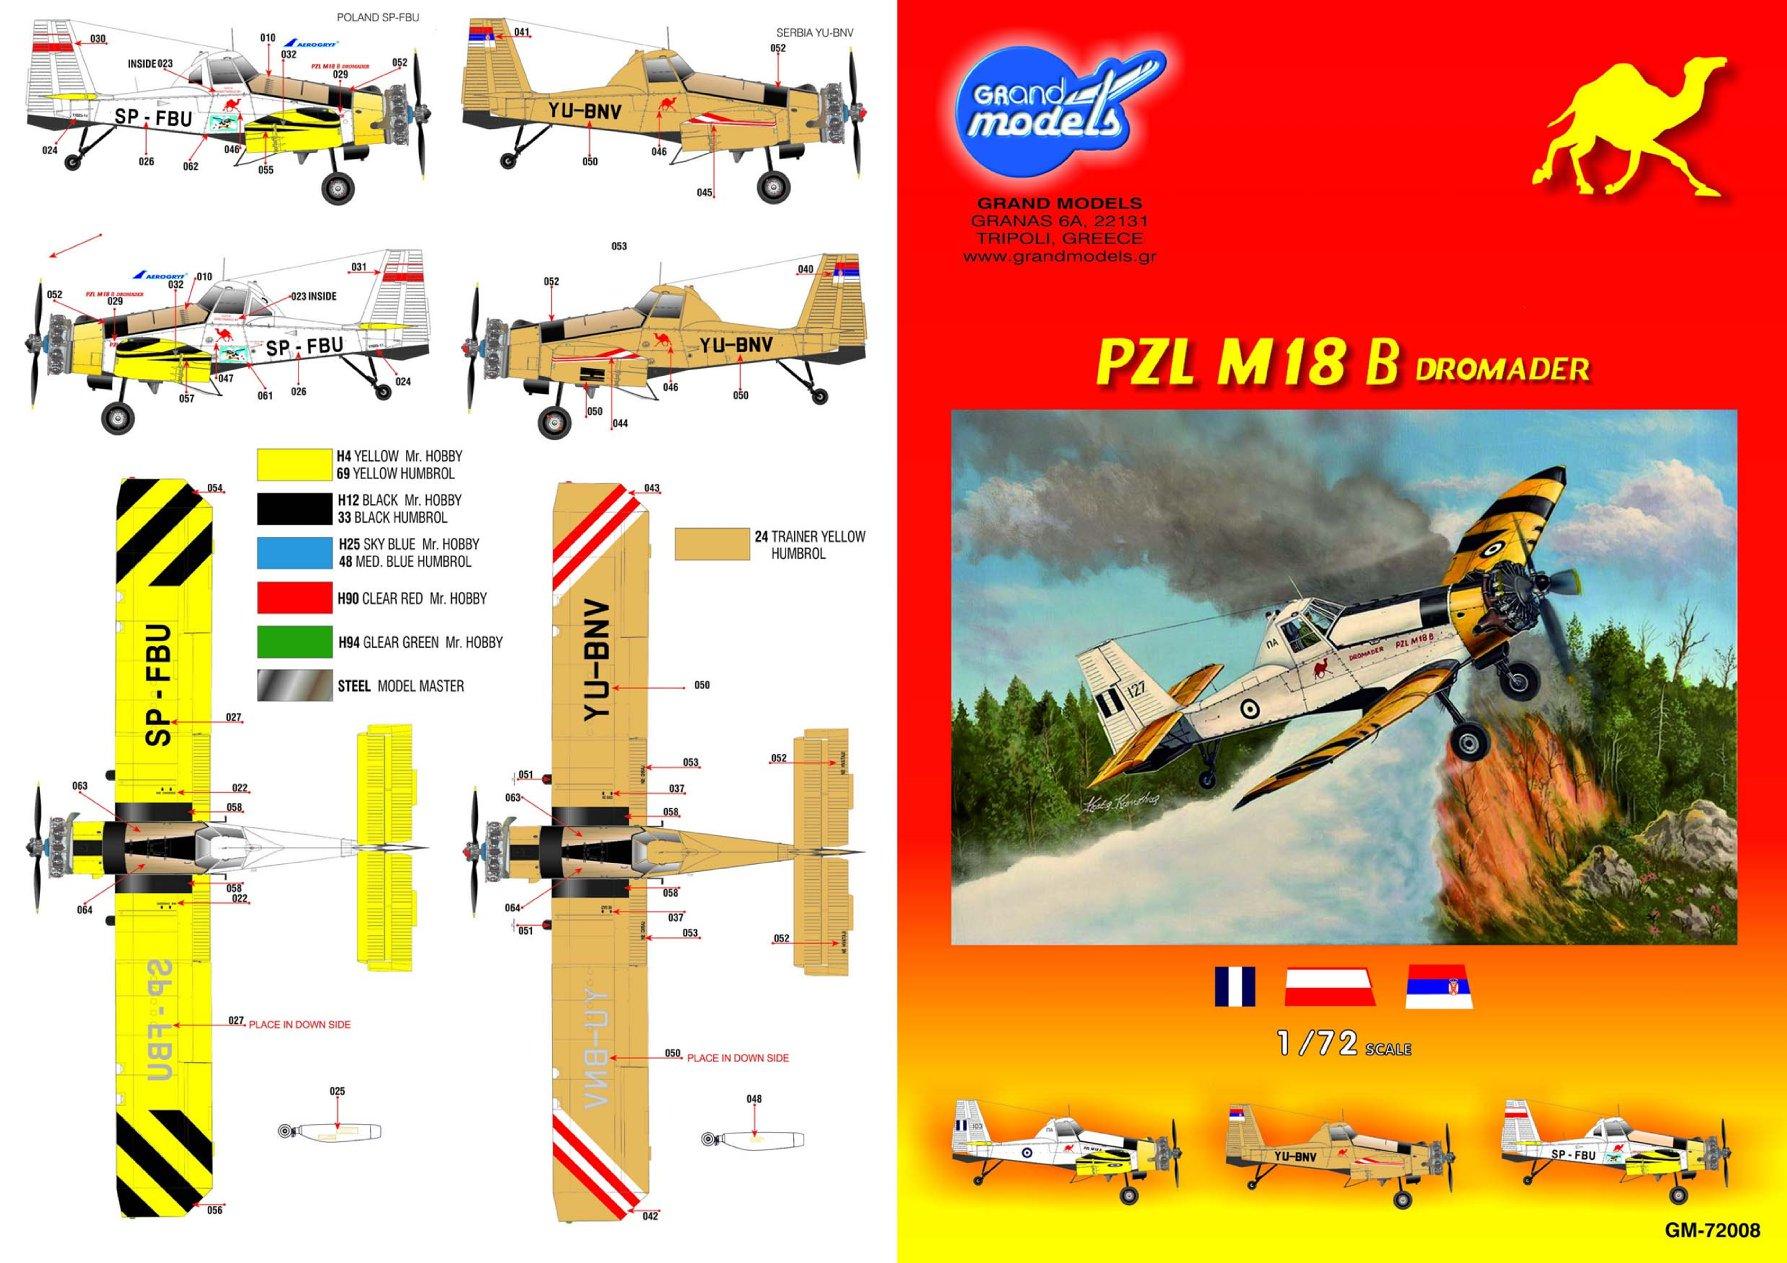 PZL M18 Dromader, Grand Models 1/72